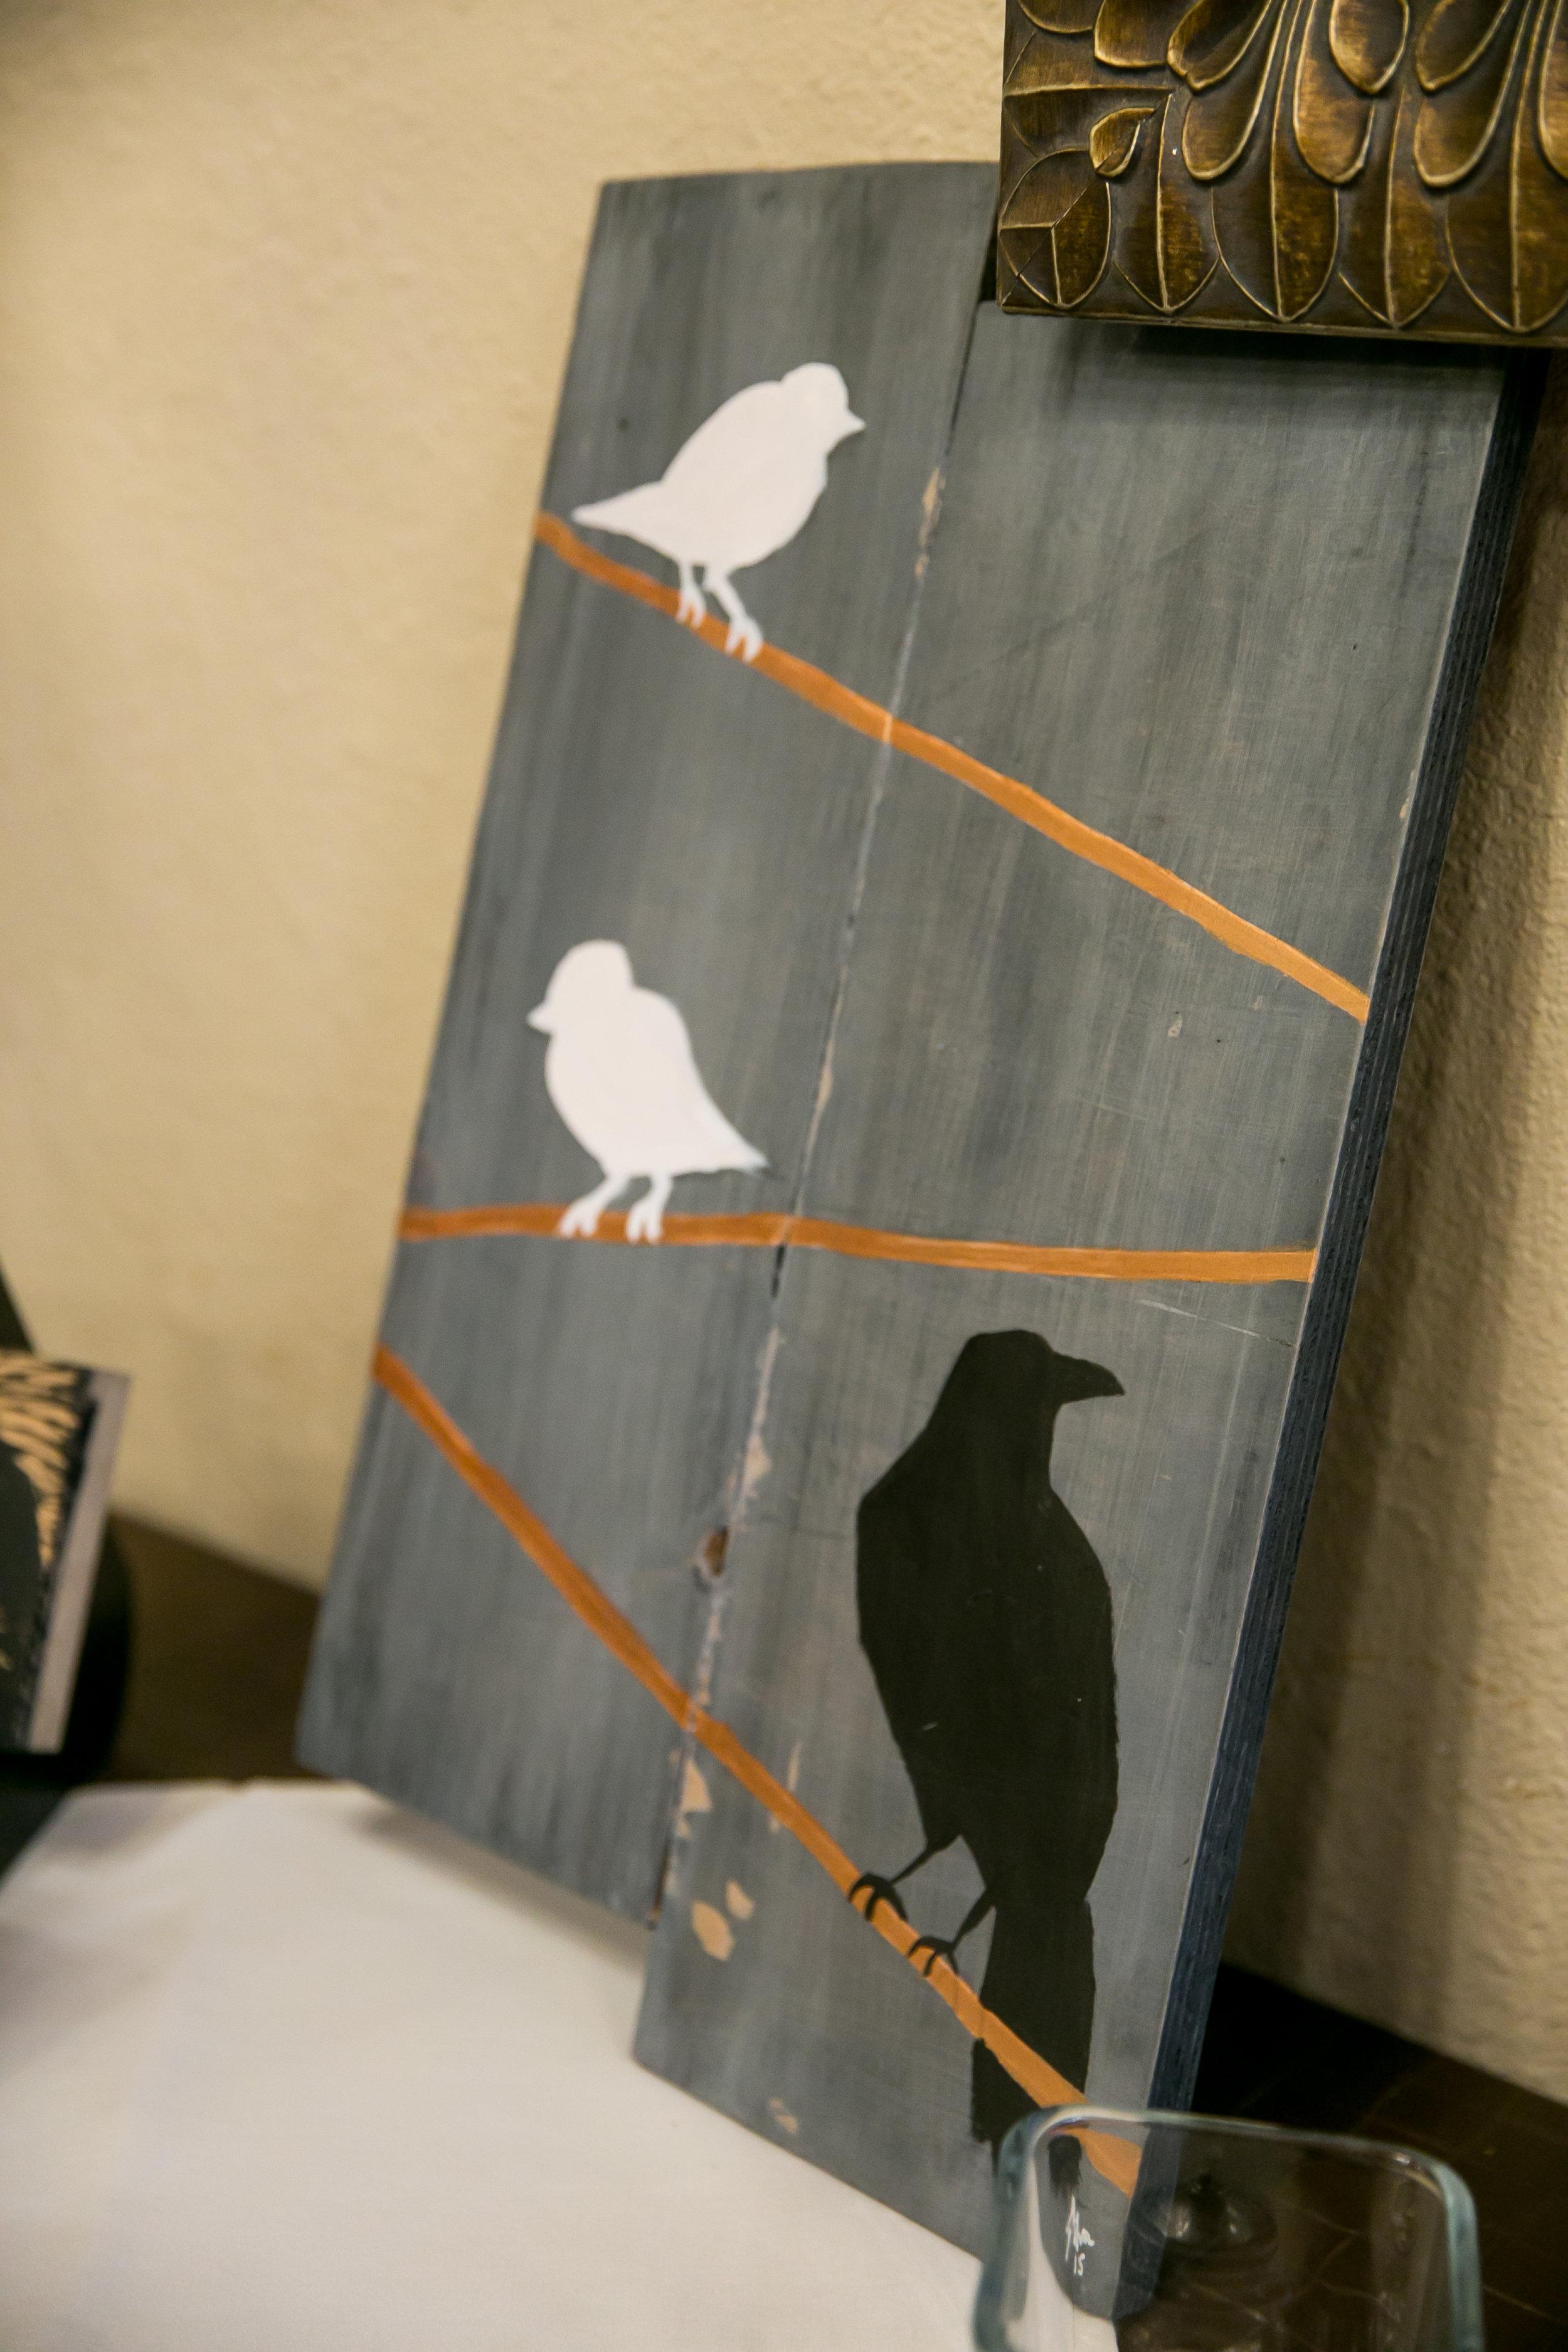 Artist: Samuel Silva  Website: www.birdsofthefather.org  Instagram: @birdsofthefather